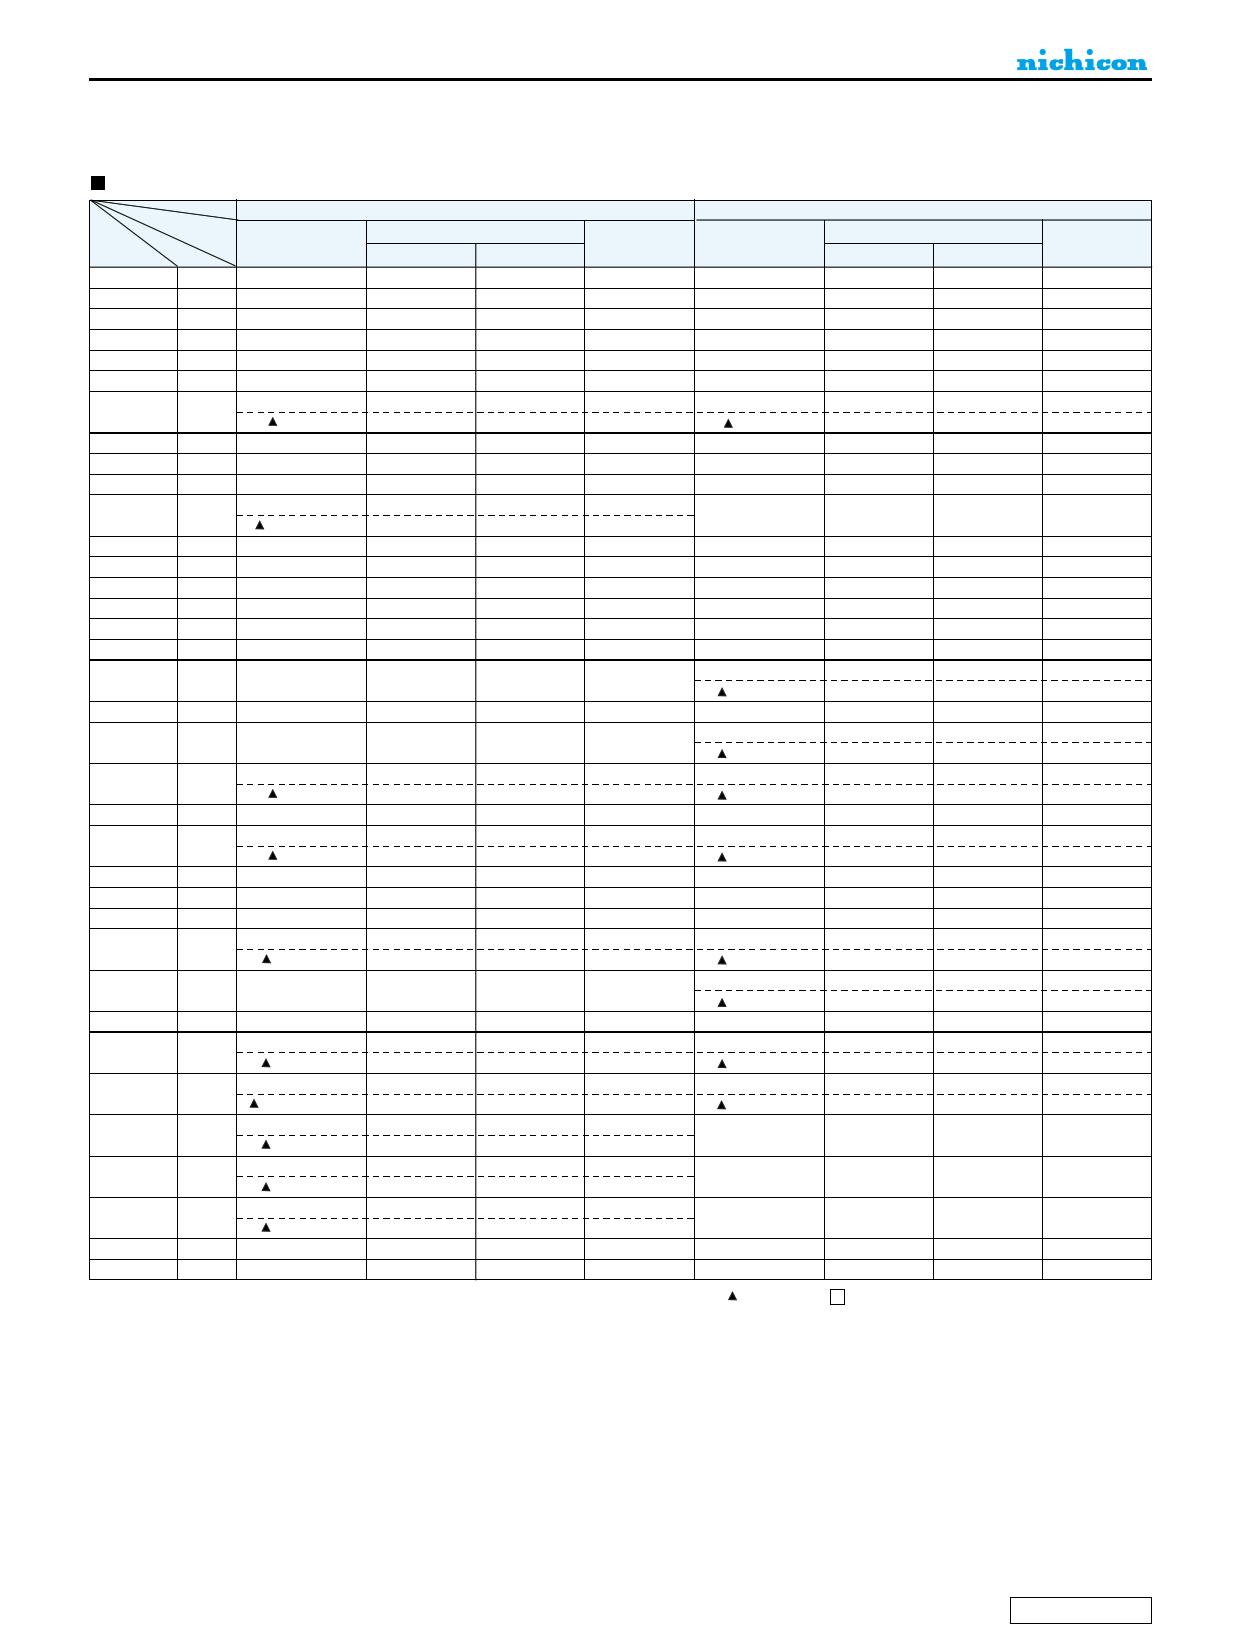 UPW1J391MHD6 pdf, 반도체, 판매, 대치품